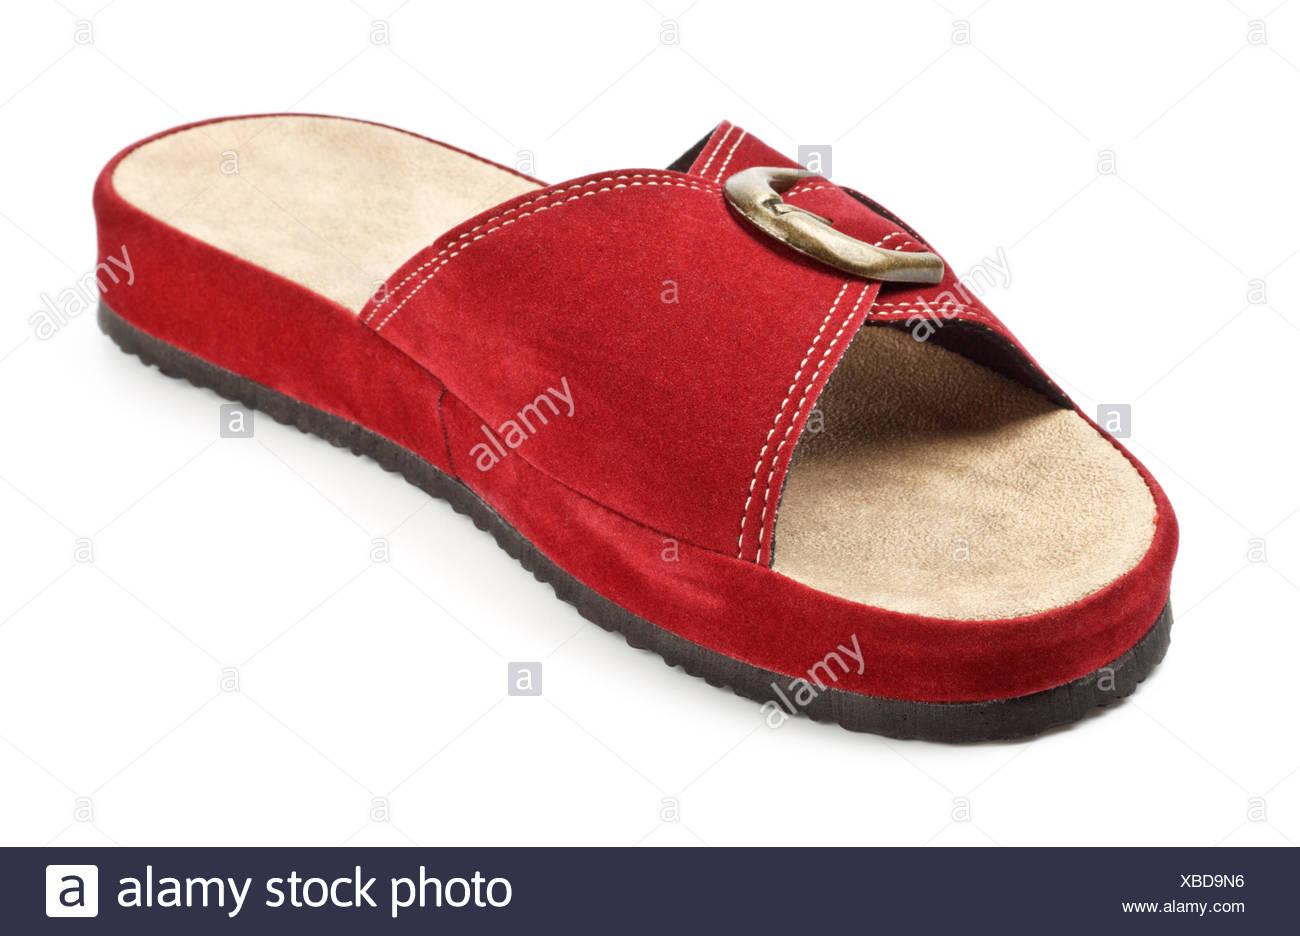 d1356656ed4 red slipper Stock Photo  282420130 - Alamy